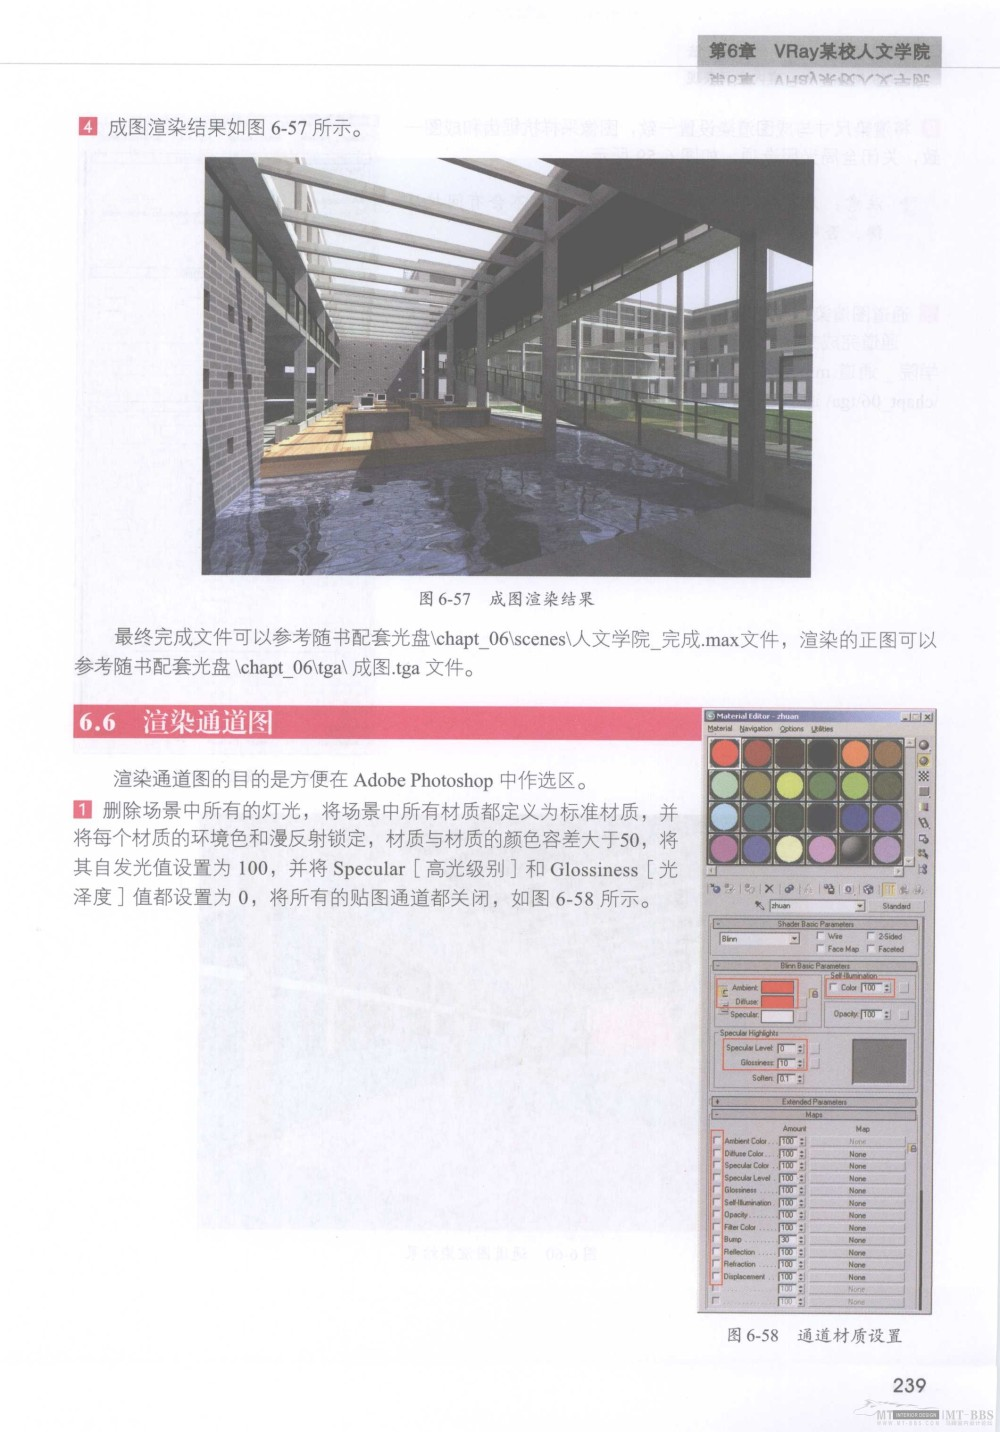 水晶石技法-3ds_Max&VRay室内空间表现_水晶石技法-3ds_Max&VRay室内空间表现_页面_245.jpg